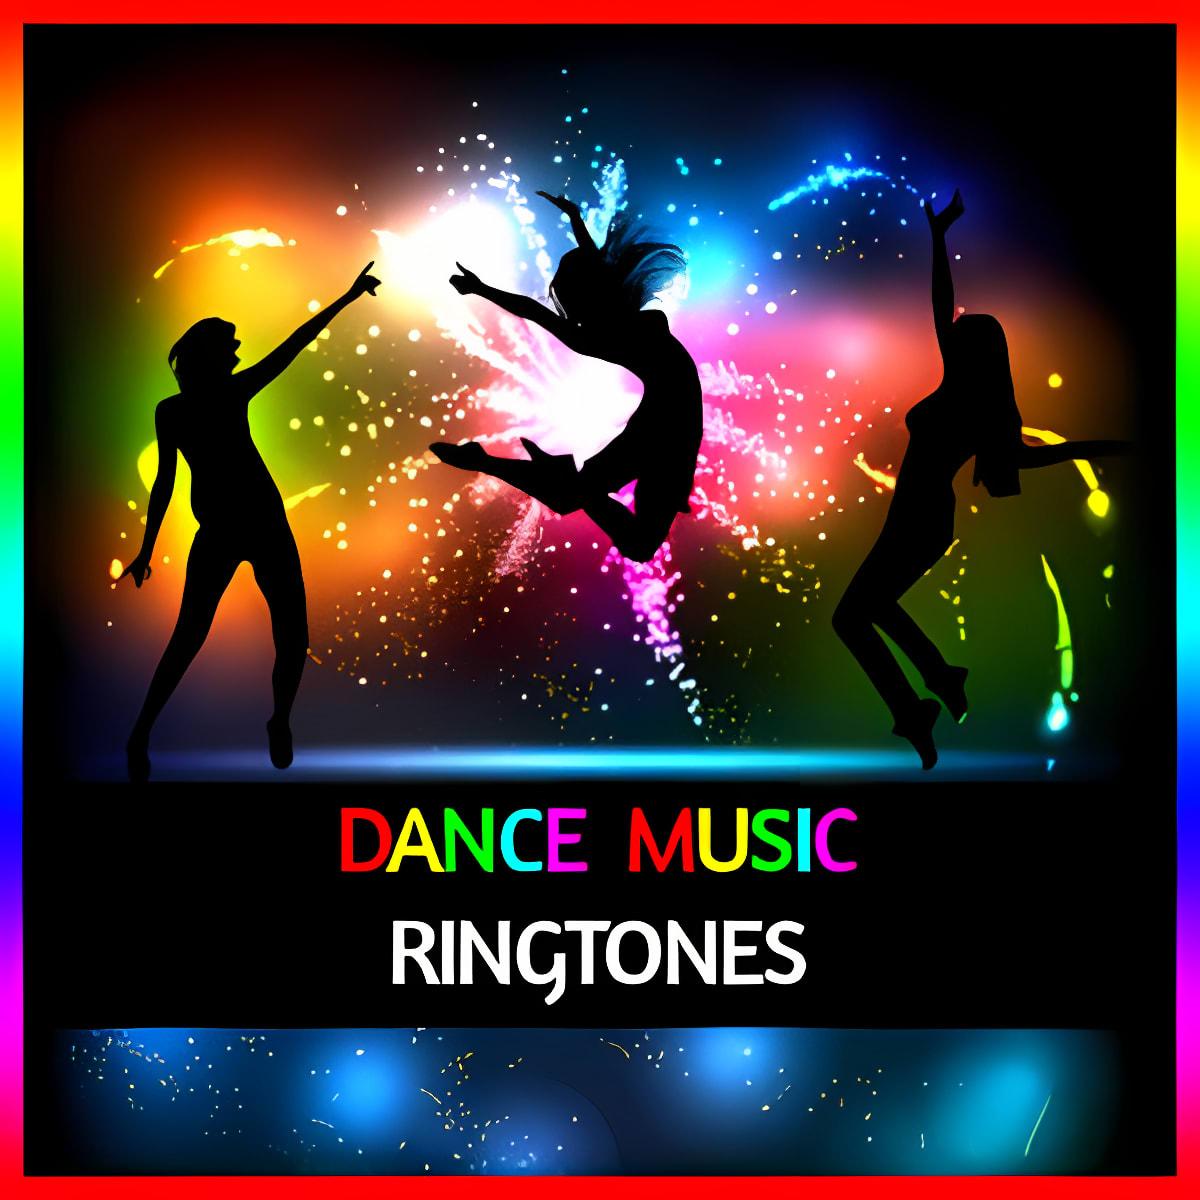 Dance-Music-Klingeltöne 1